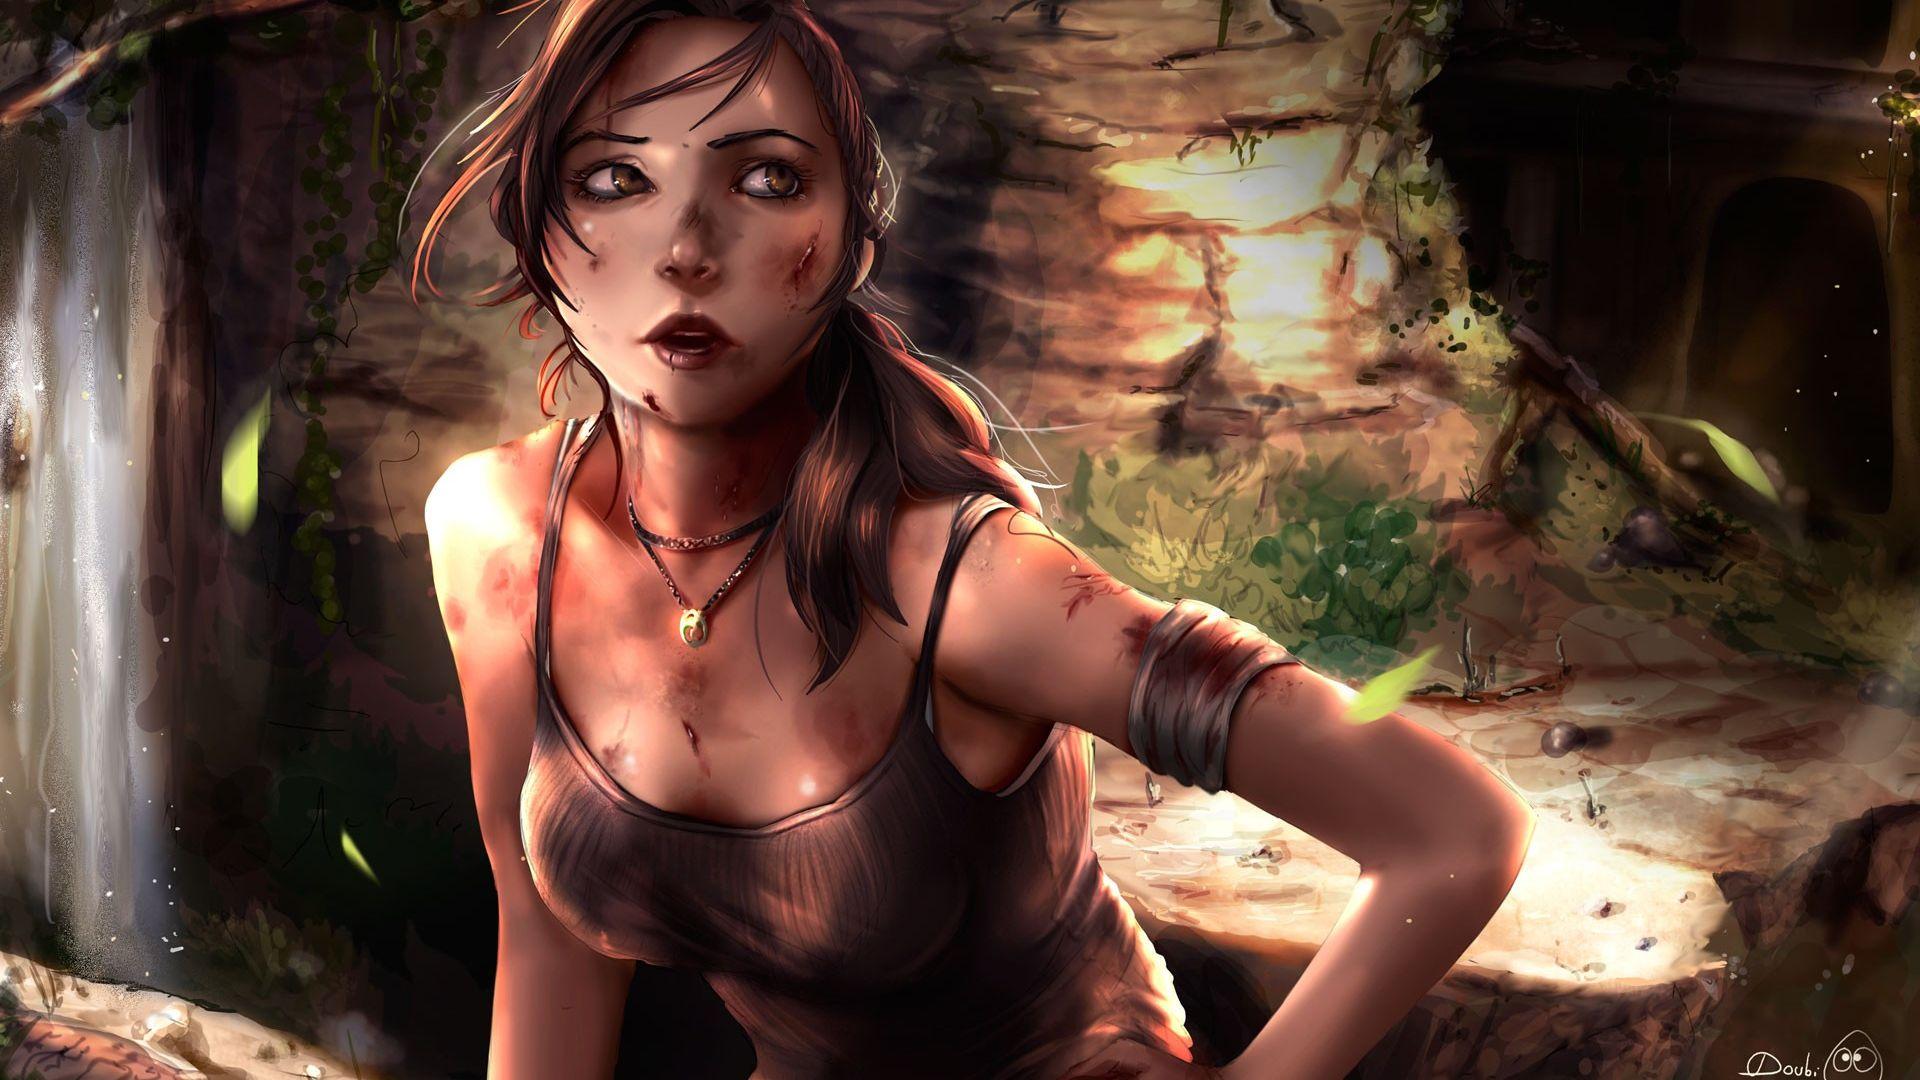 Lara Croft art wallpaper